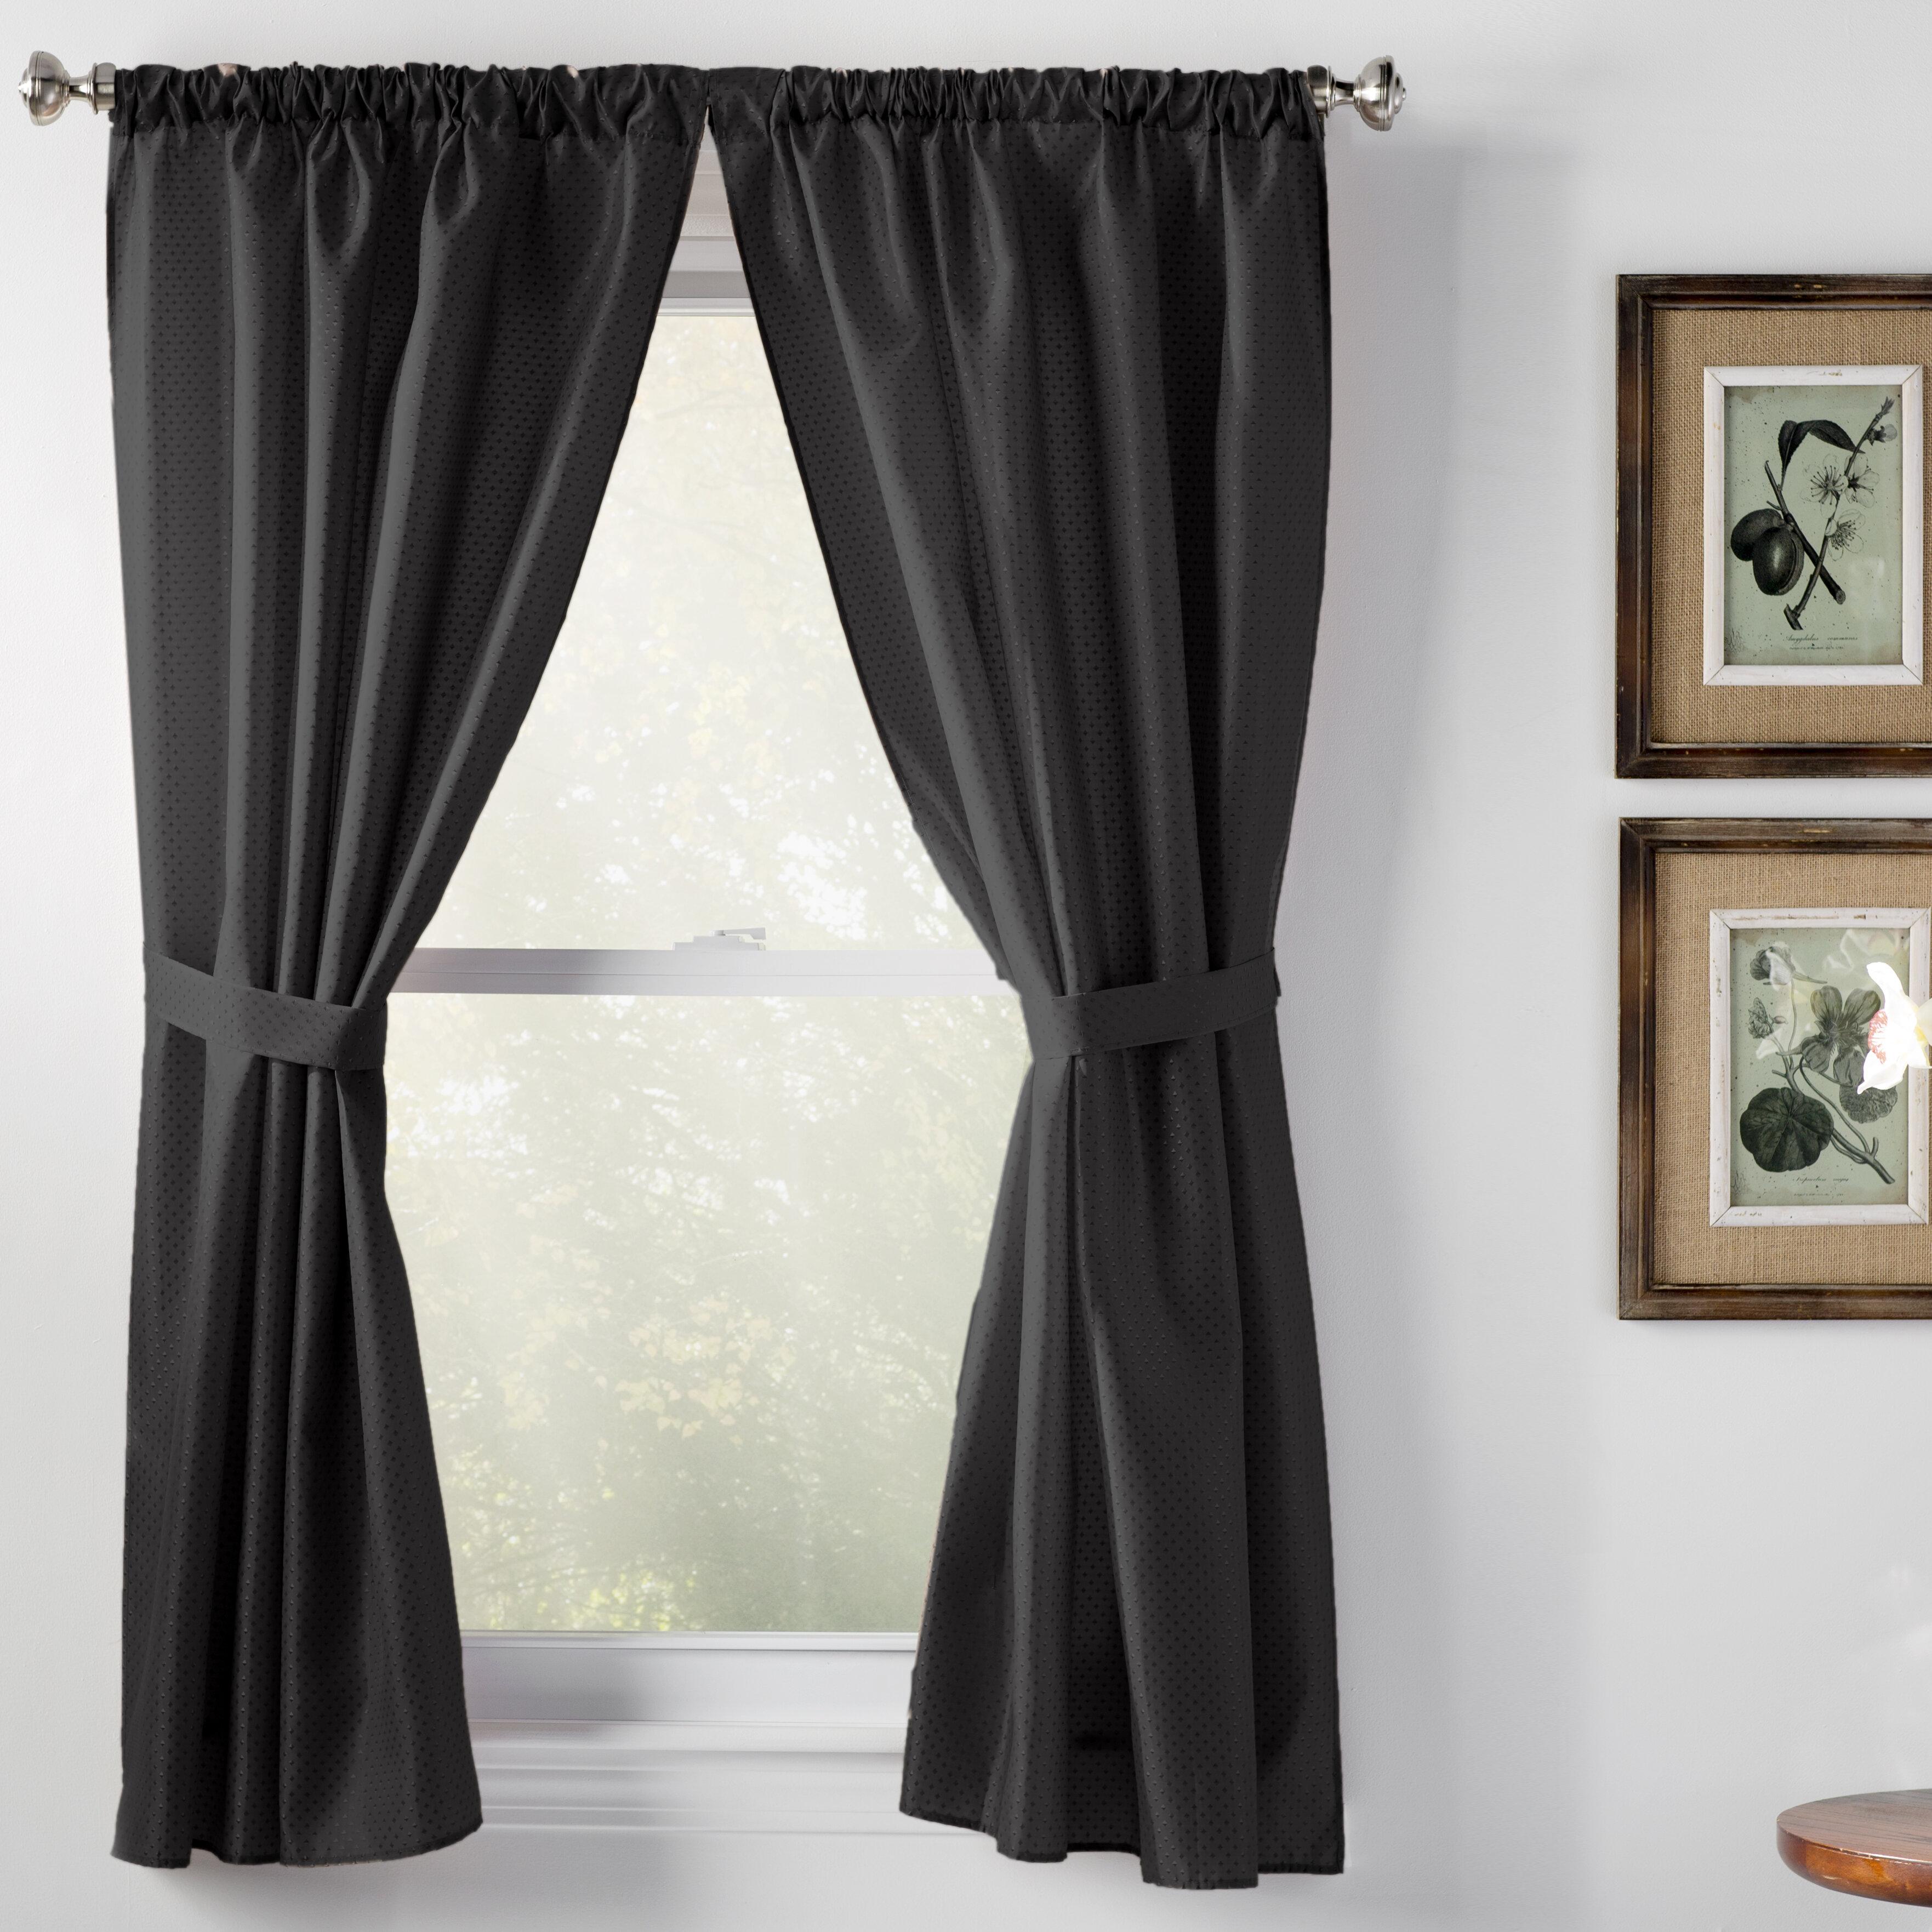 Wayfair Basics Solid Semi-Sheer Rod Pocket Bathroom Curtain Panels